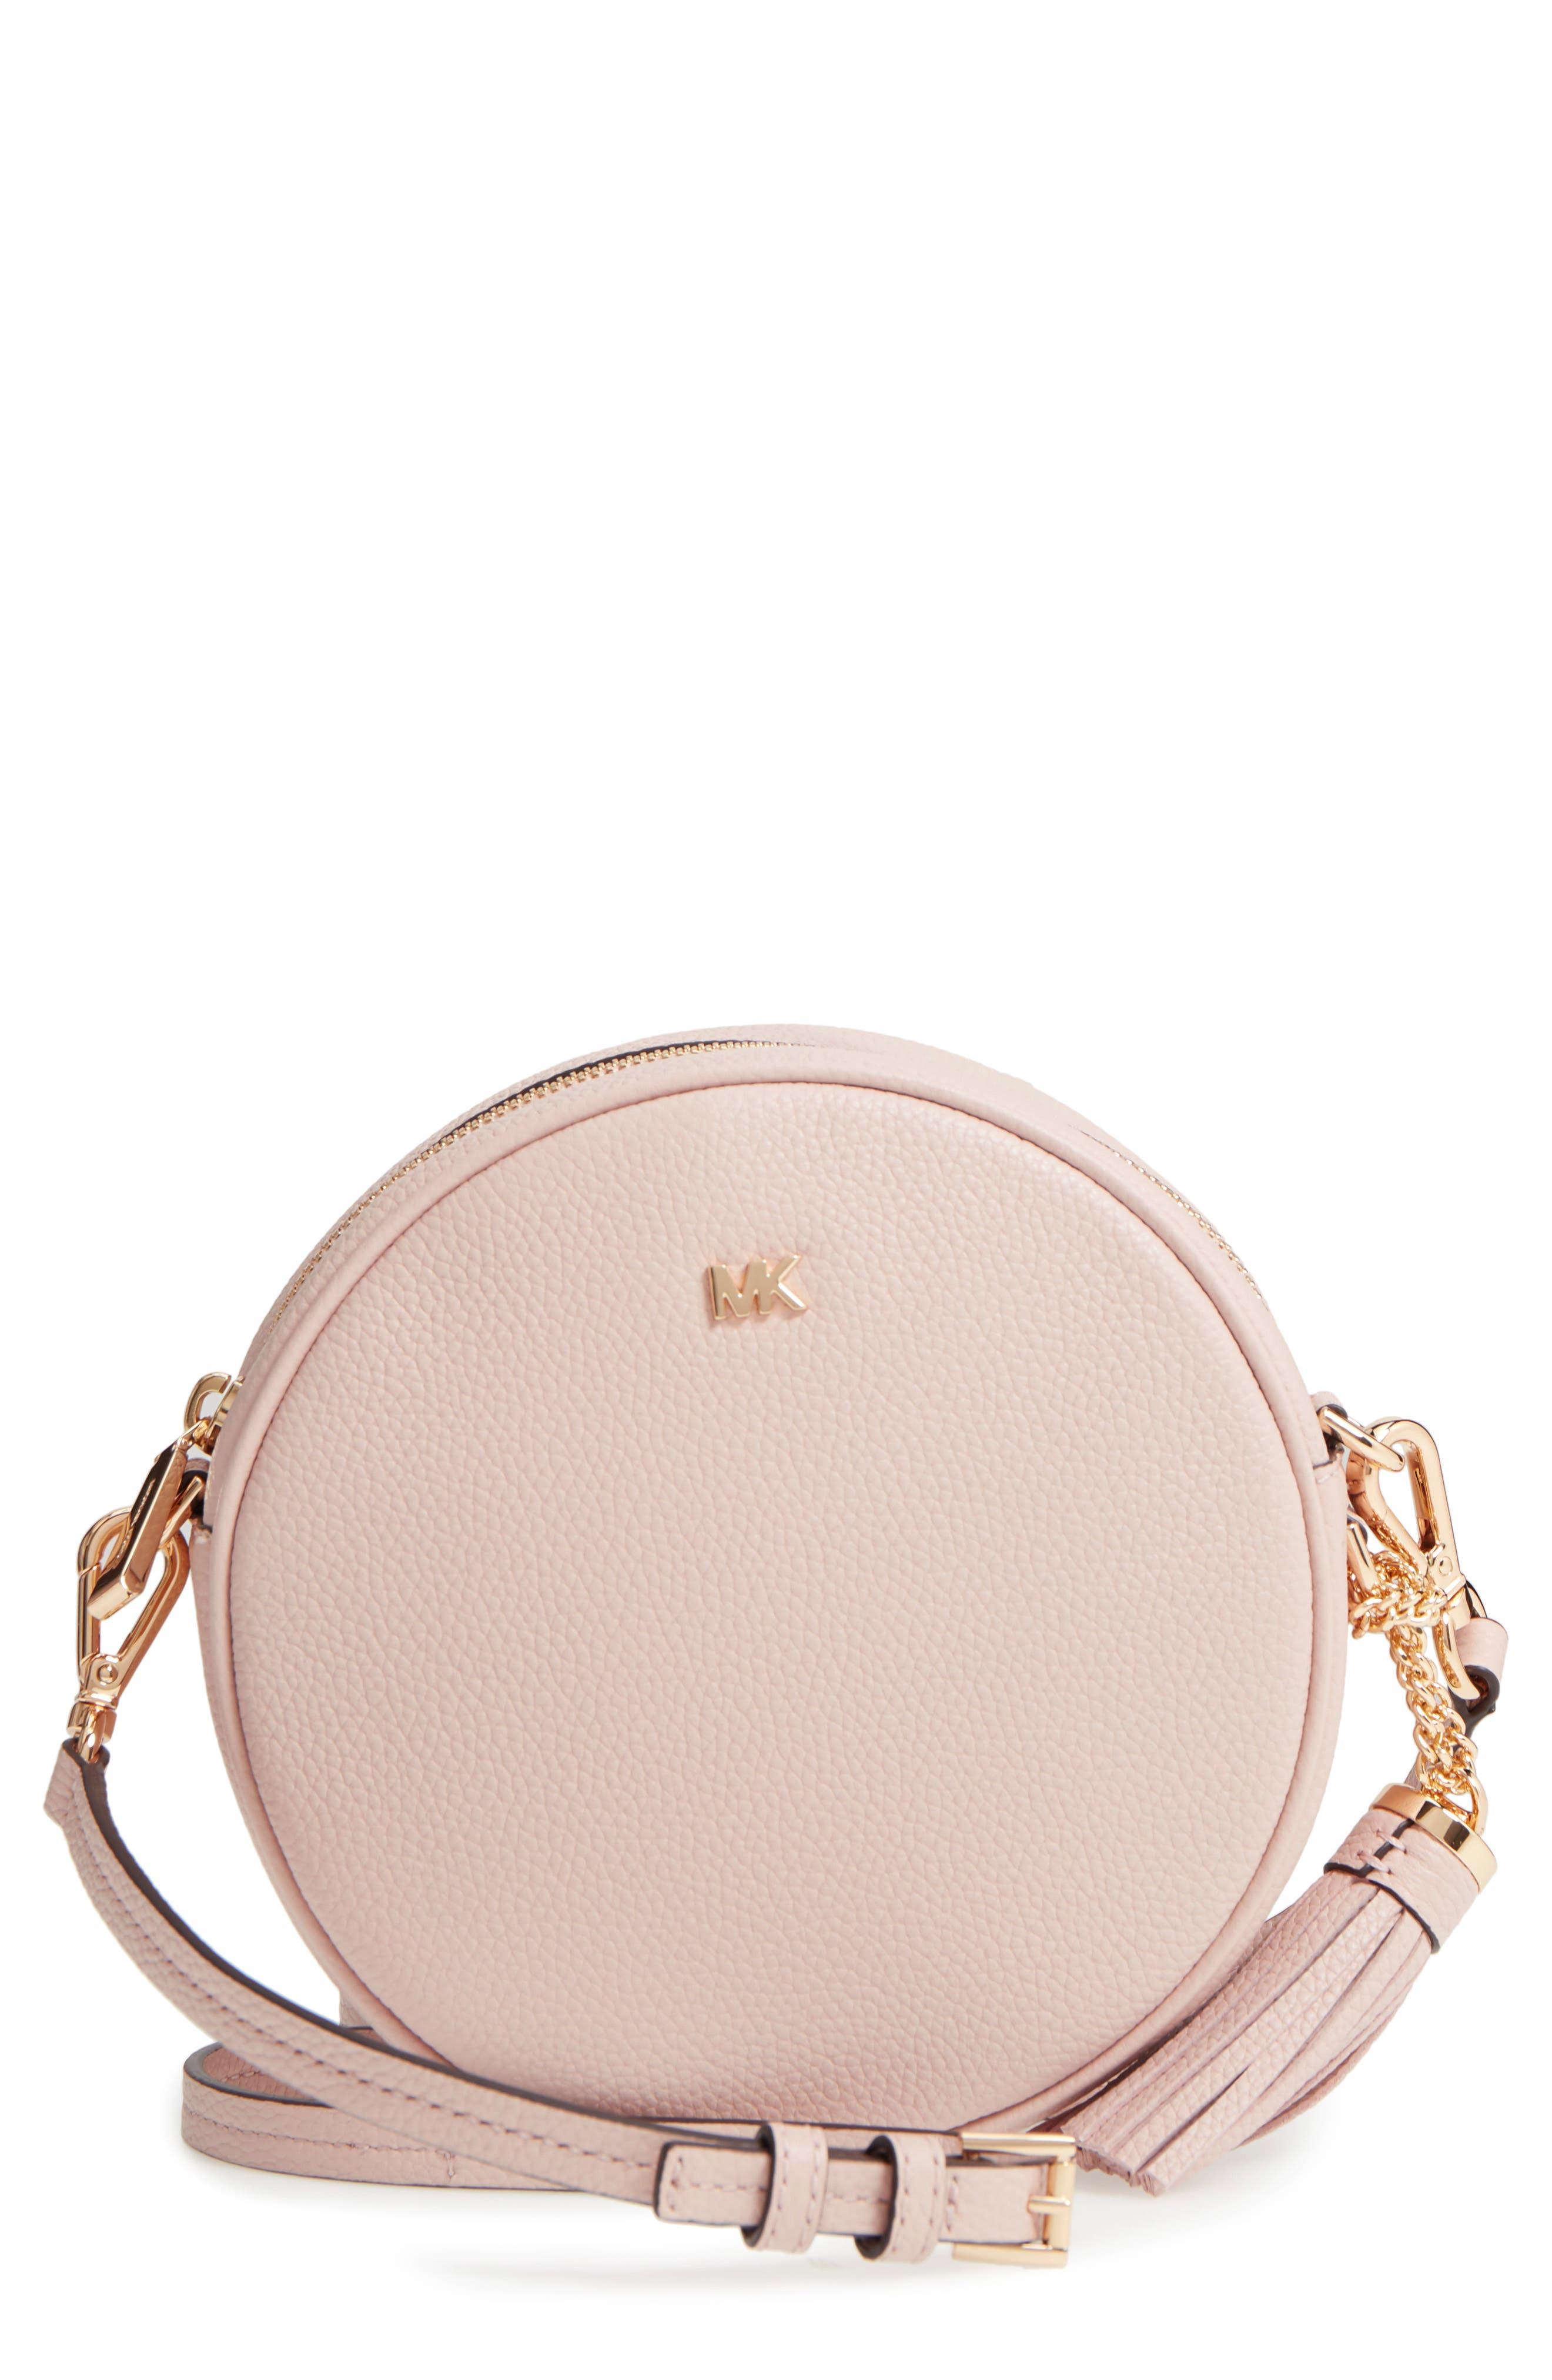 Medium Leather Canteen Bag,                             Main thumbnail 1, color,                             Soft Pink